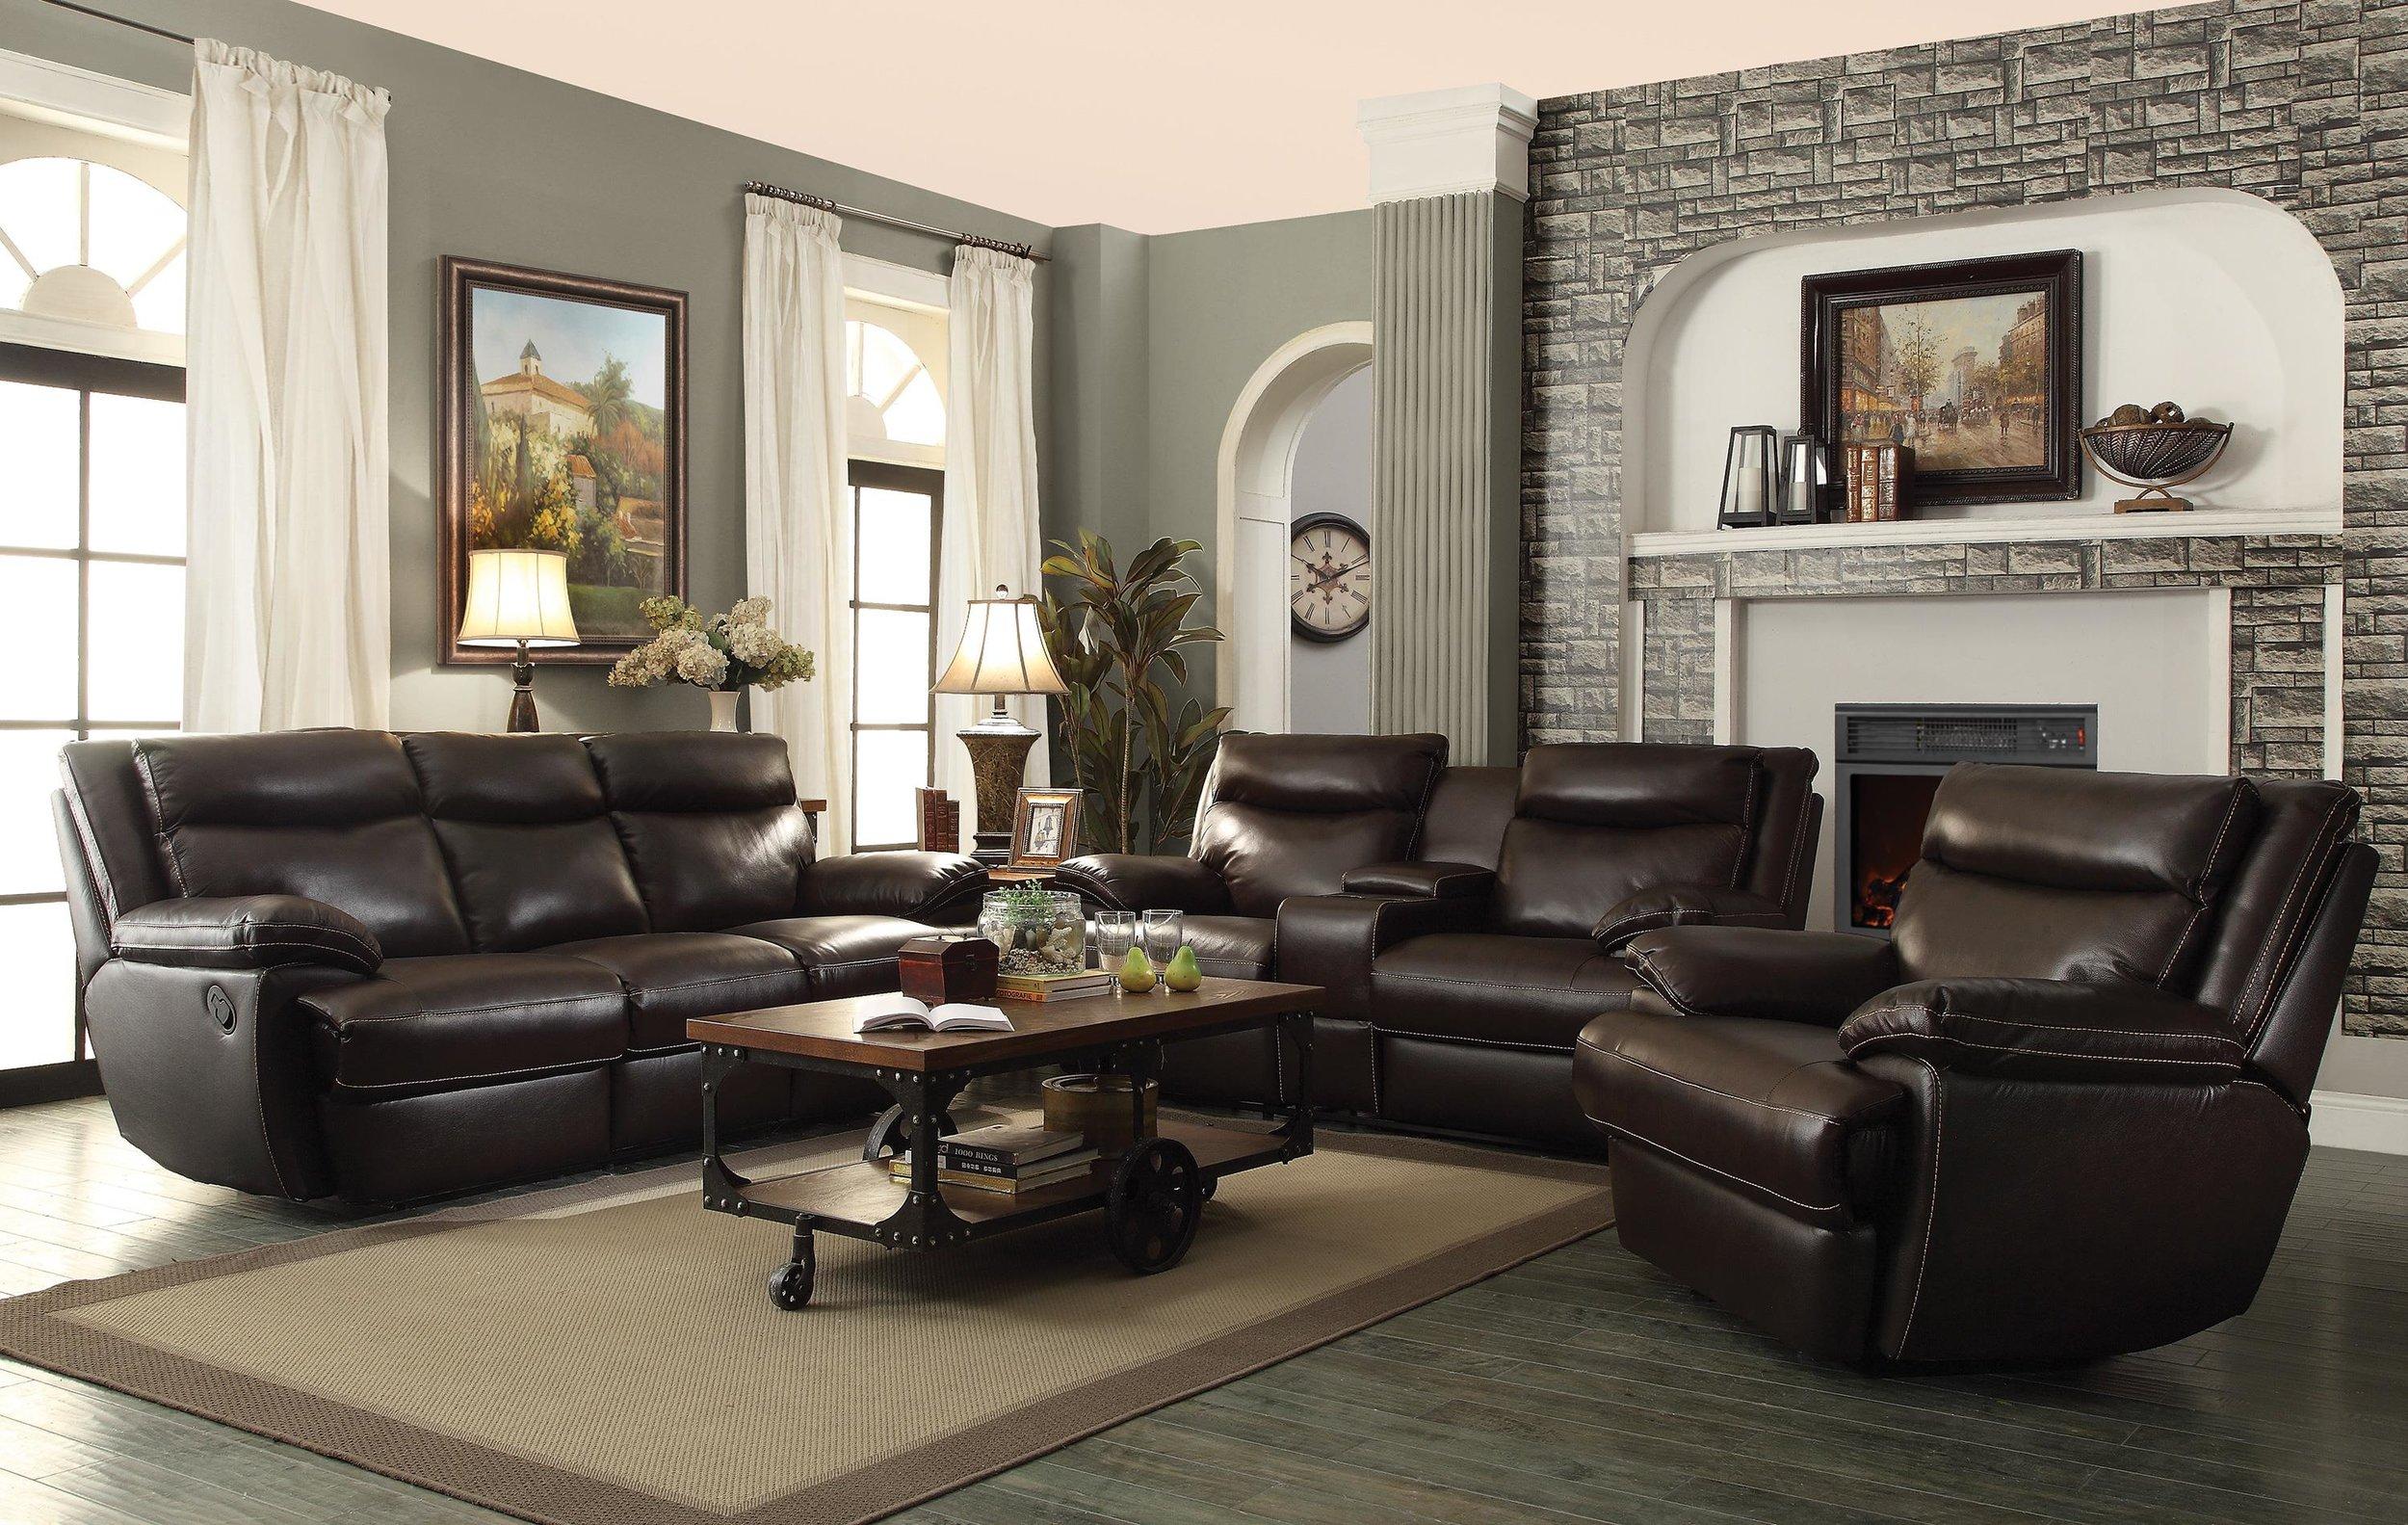 Elegant ... Coco Furniture Gallery By Carlos Recliner Sofa Coco Furniture Gallery  Furnishing ...